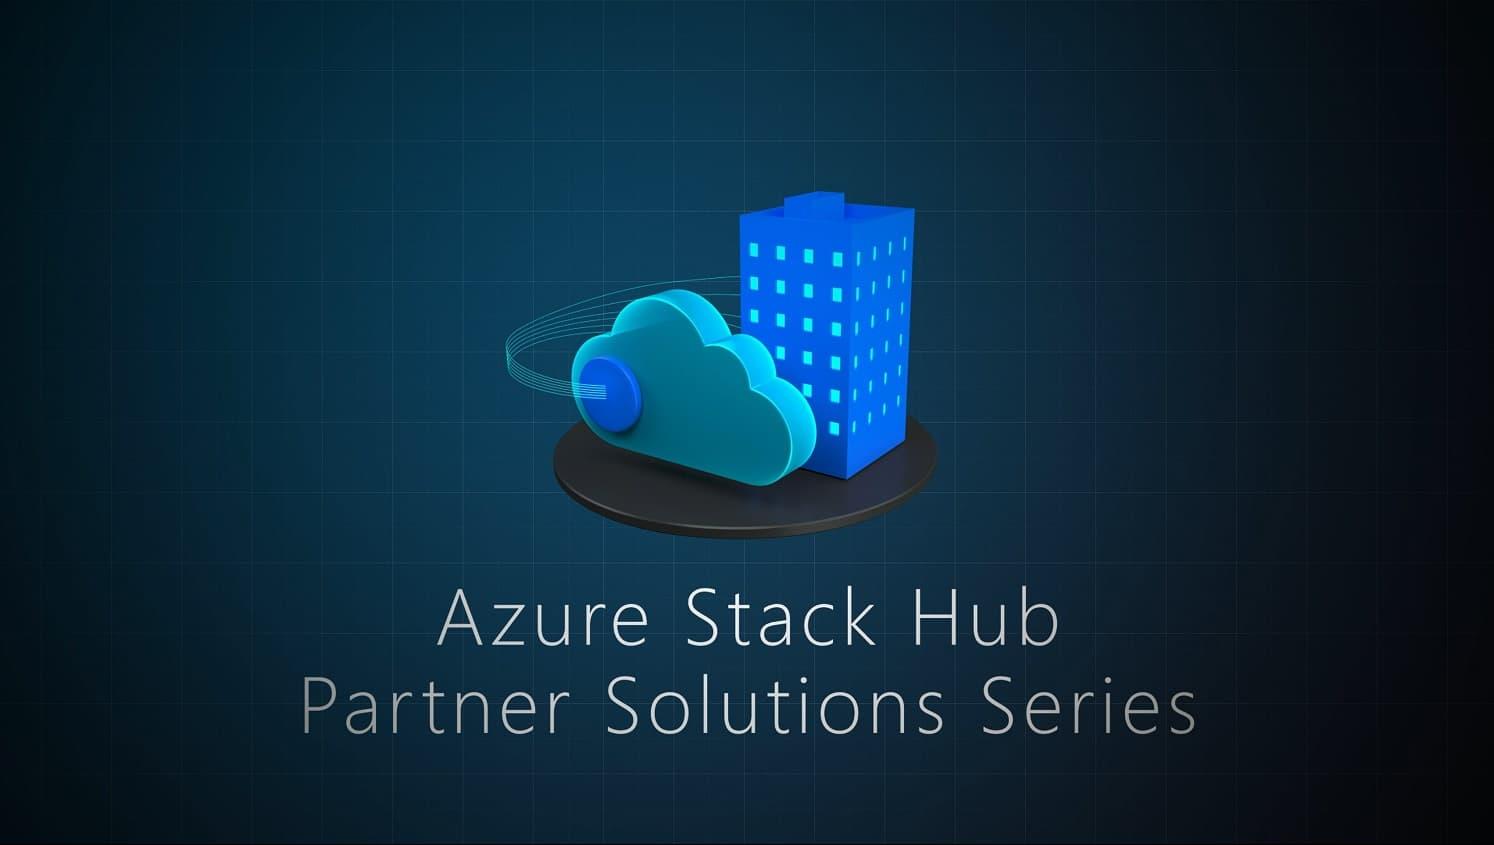 Azure Stack Hub Partner Solutions Video Series